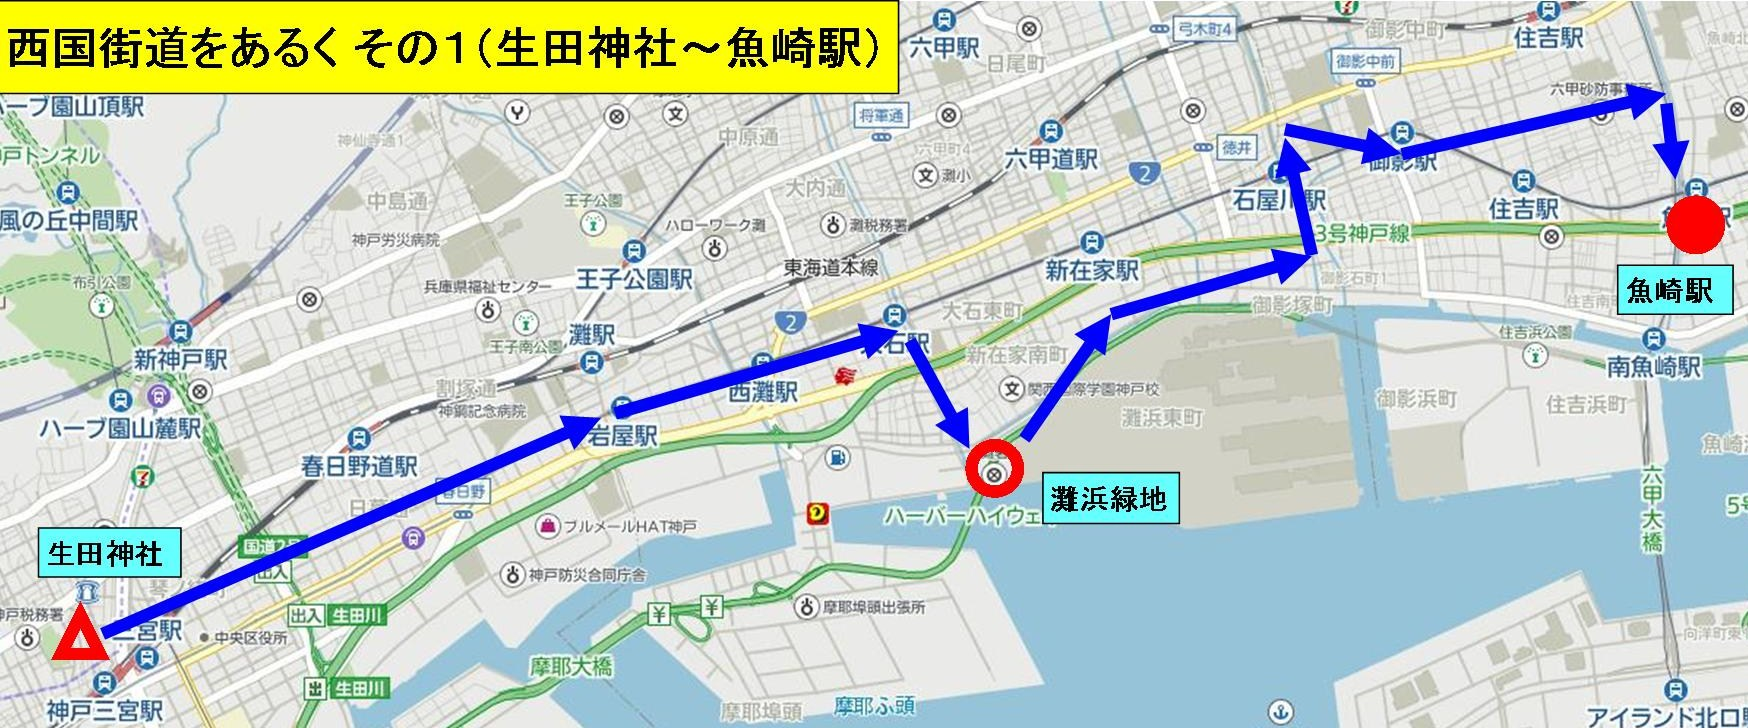 b地図block.jpg